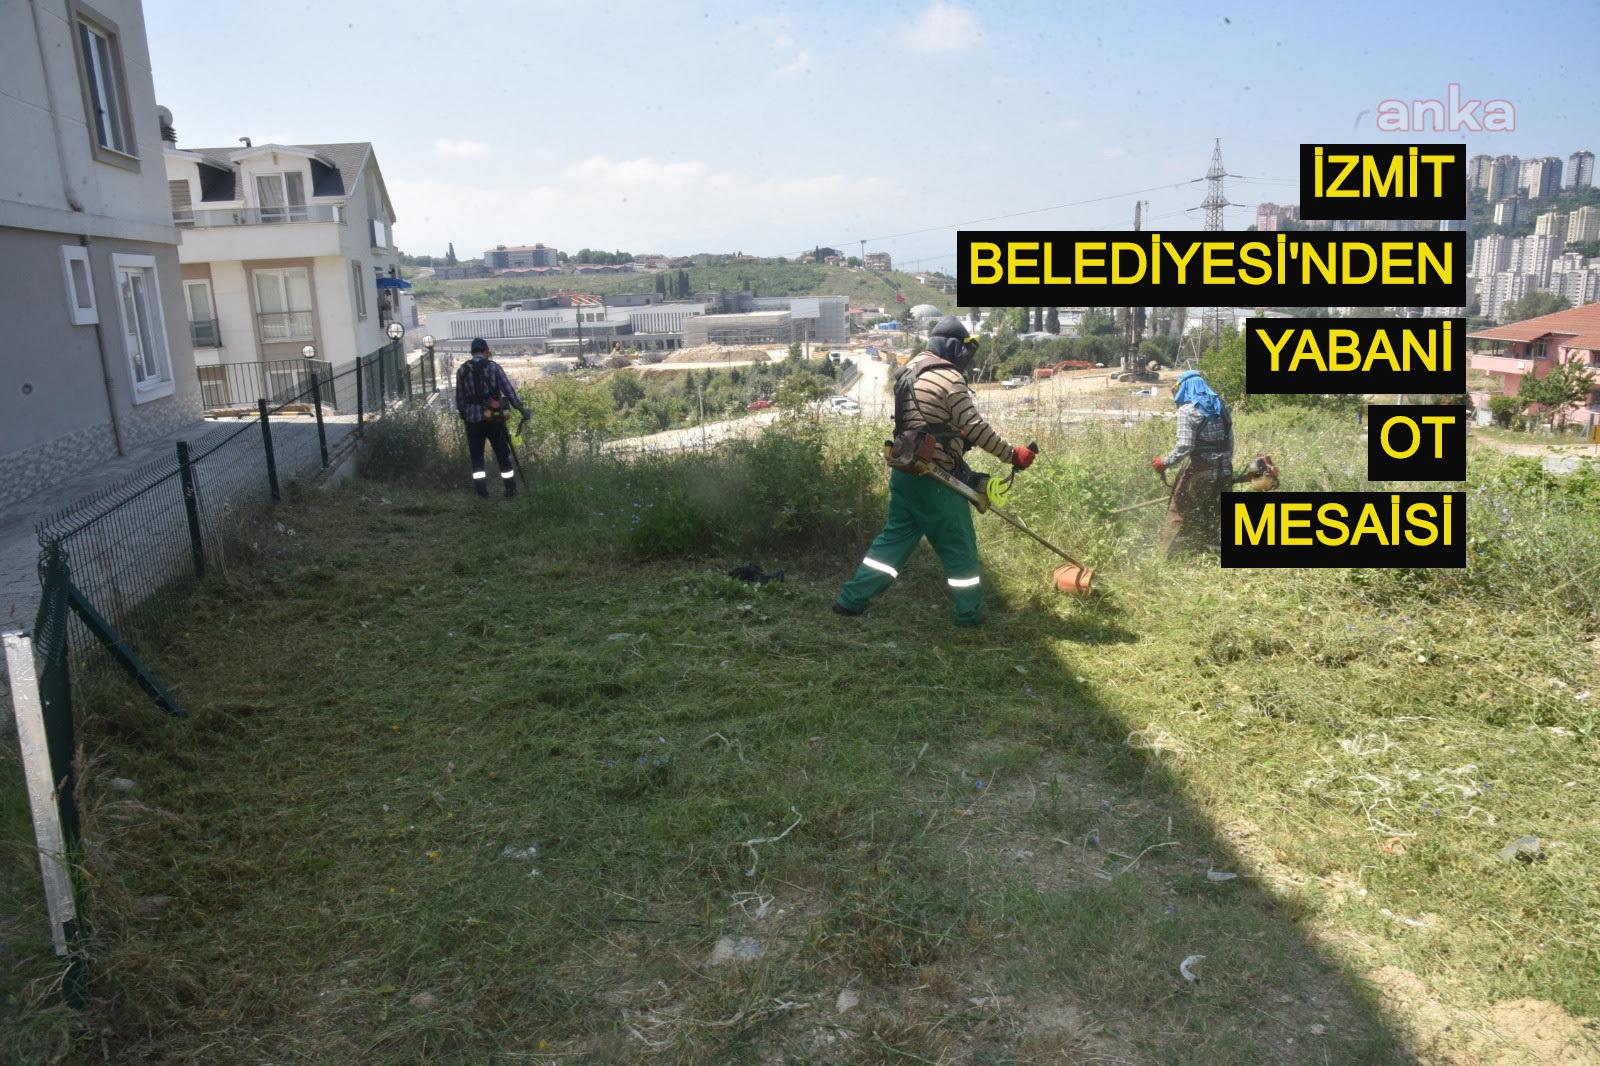 İzmit Belediyesi'nden yabani ot mesaisi